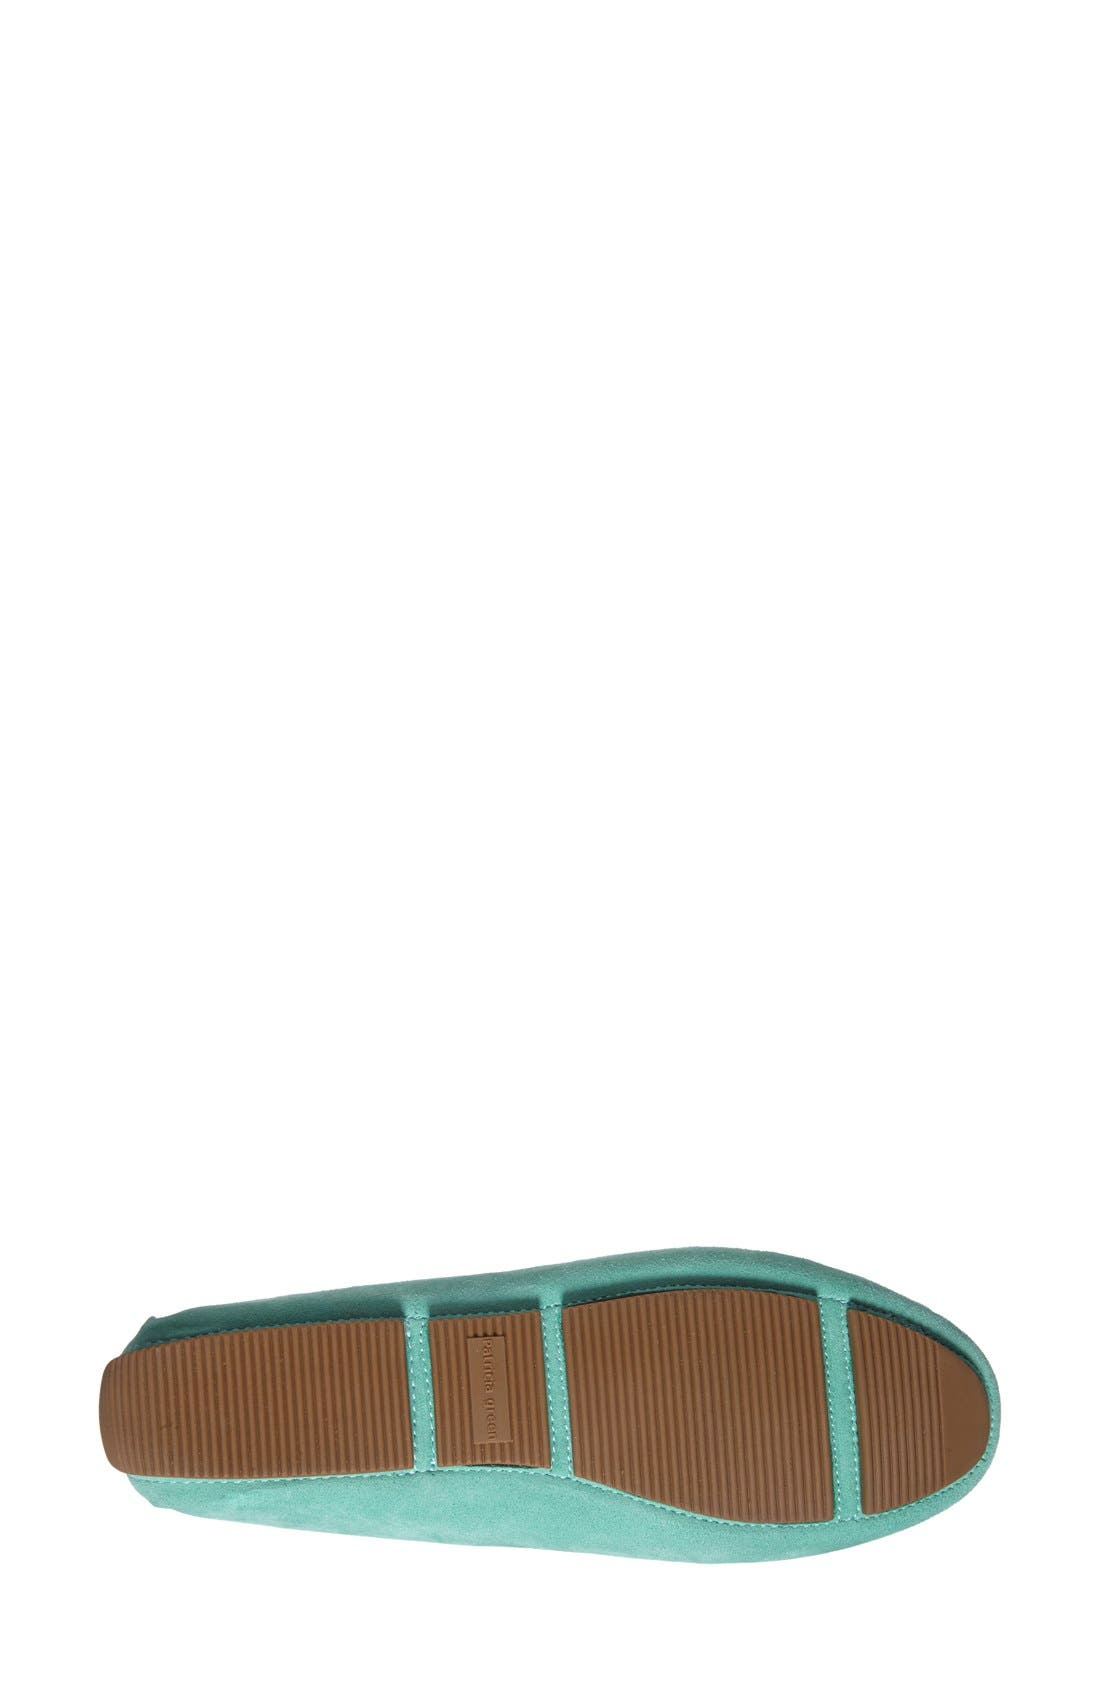 Alternate Image 2  - patricia green 'Cambridge' Bit Loafer (Women)